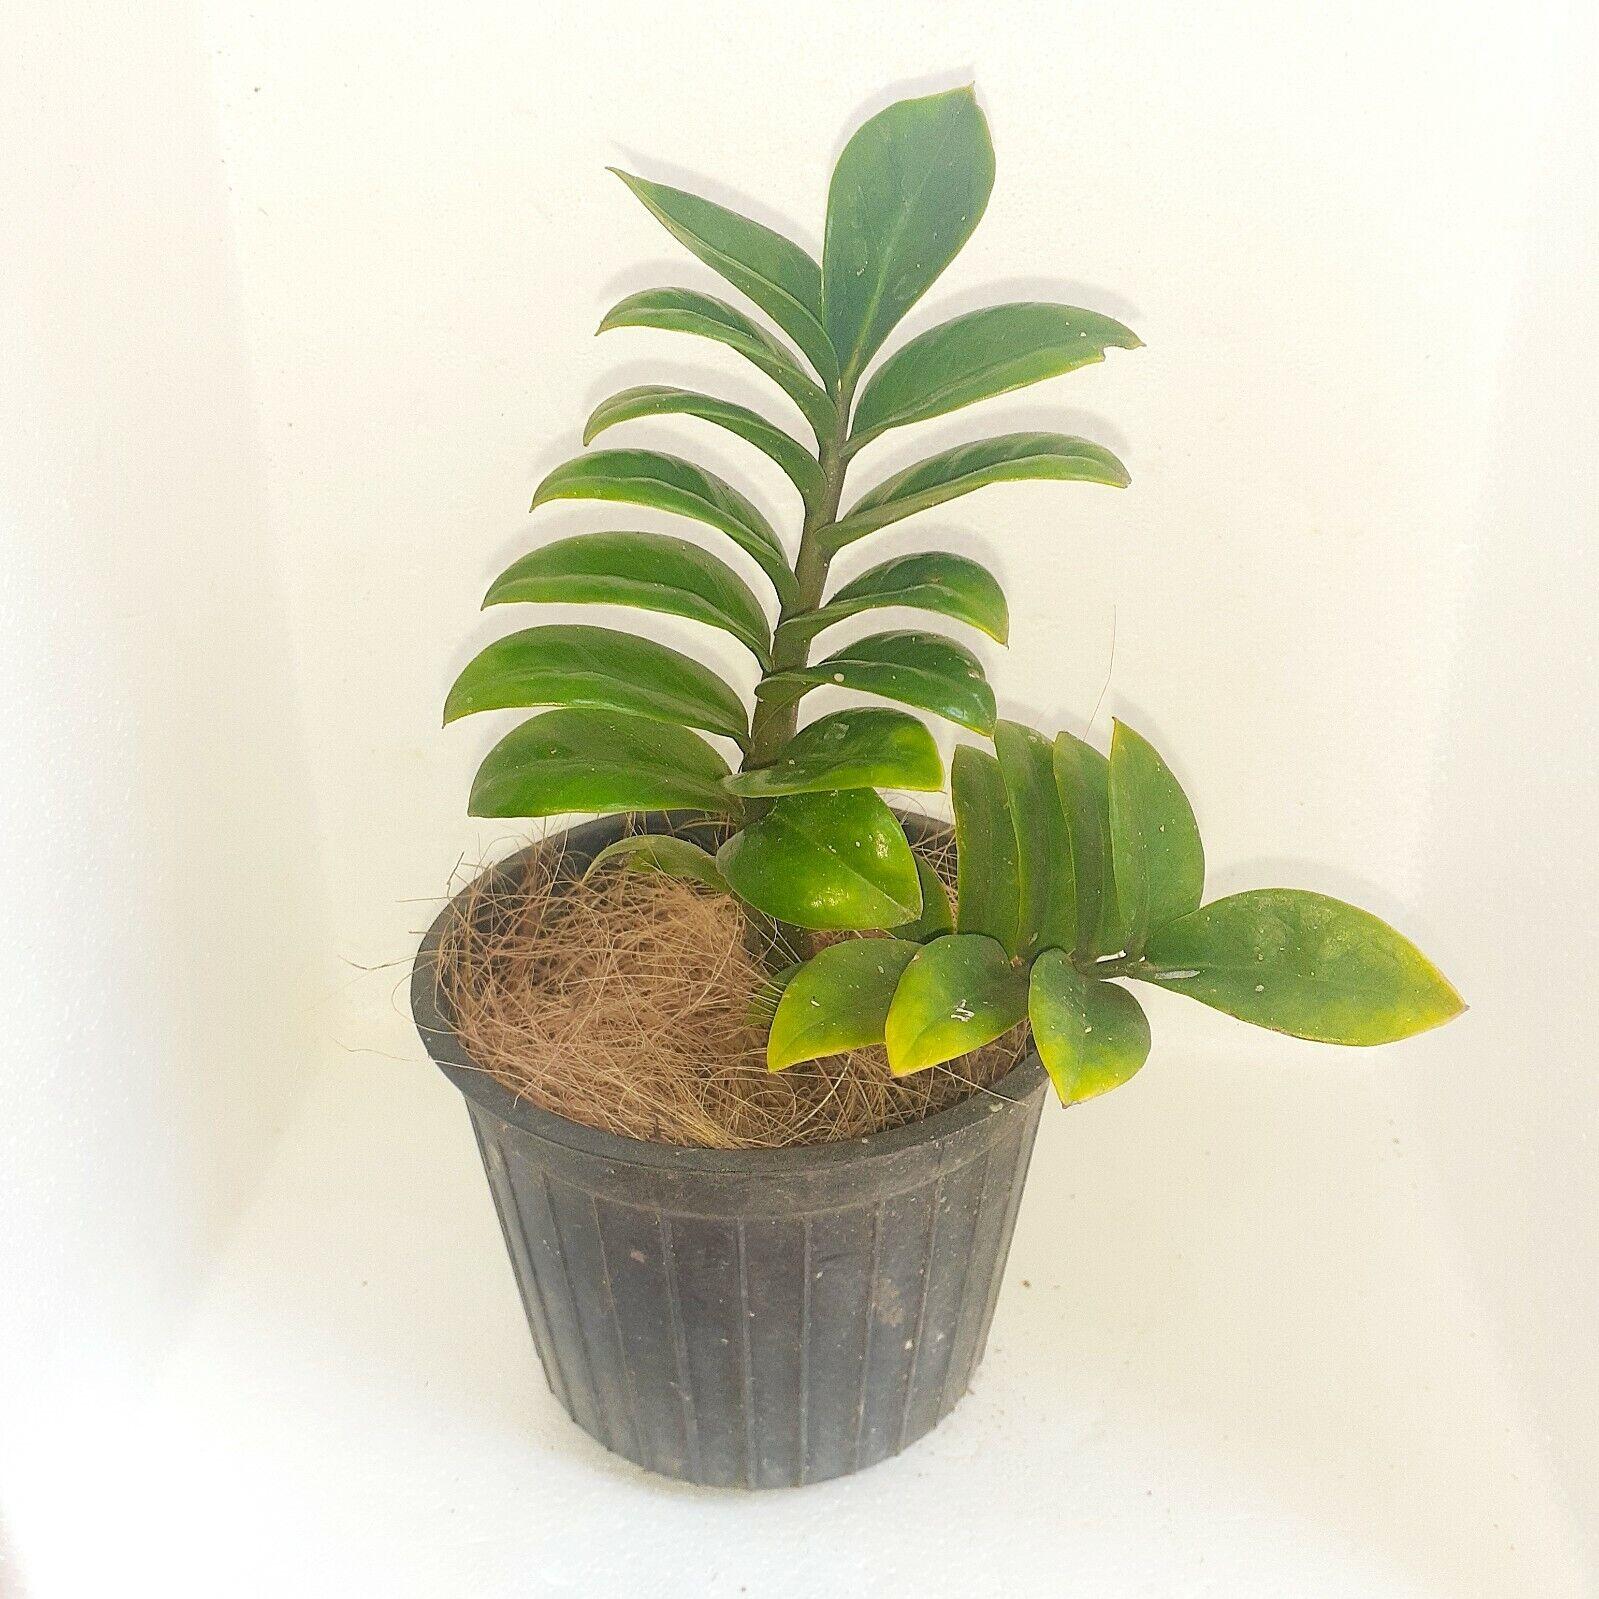 Natural Coconut Husk Coir Hydroponics Fiber Pure Organic Orchids Flowers Plants